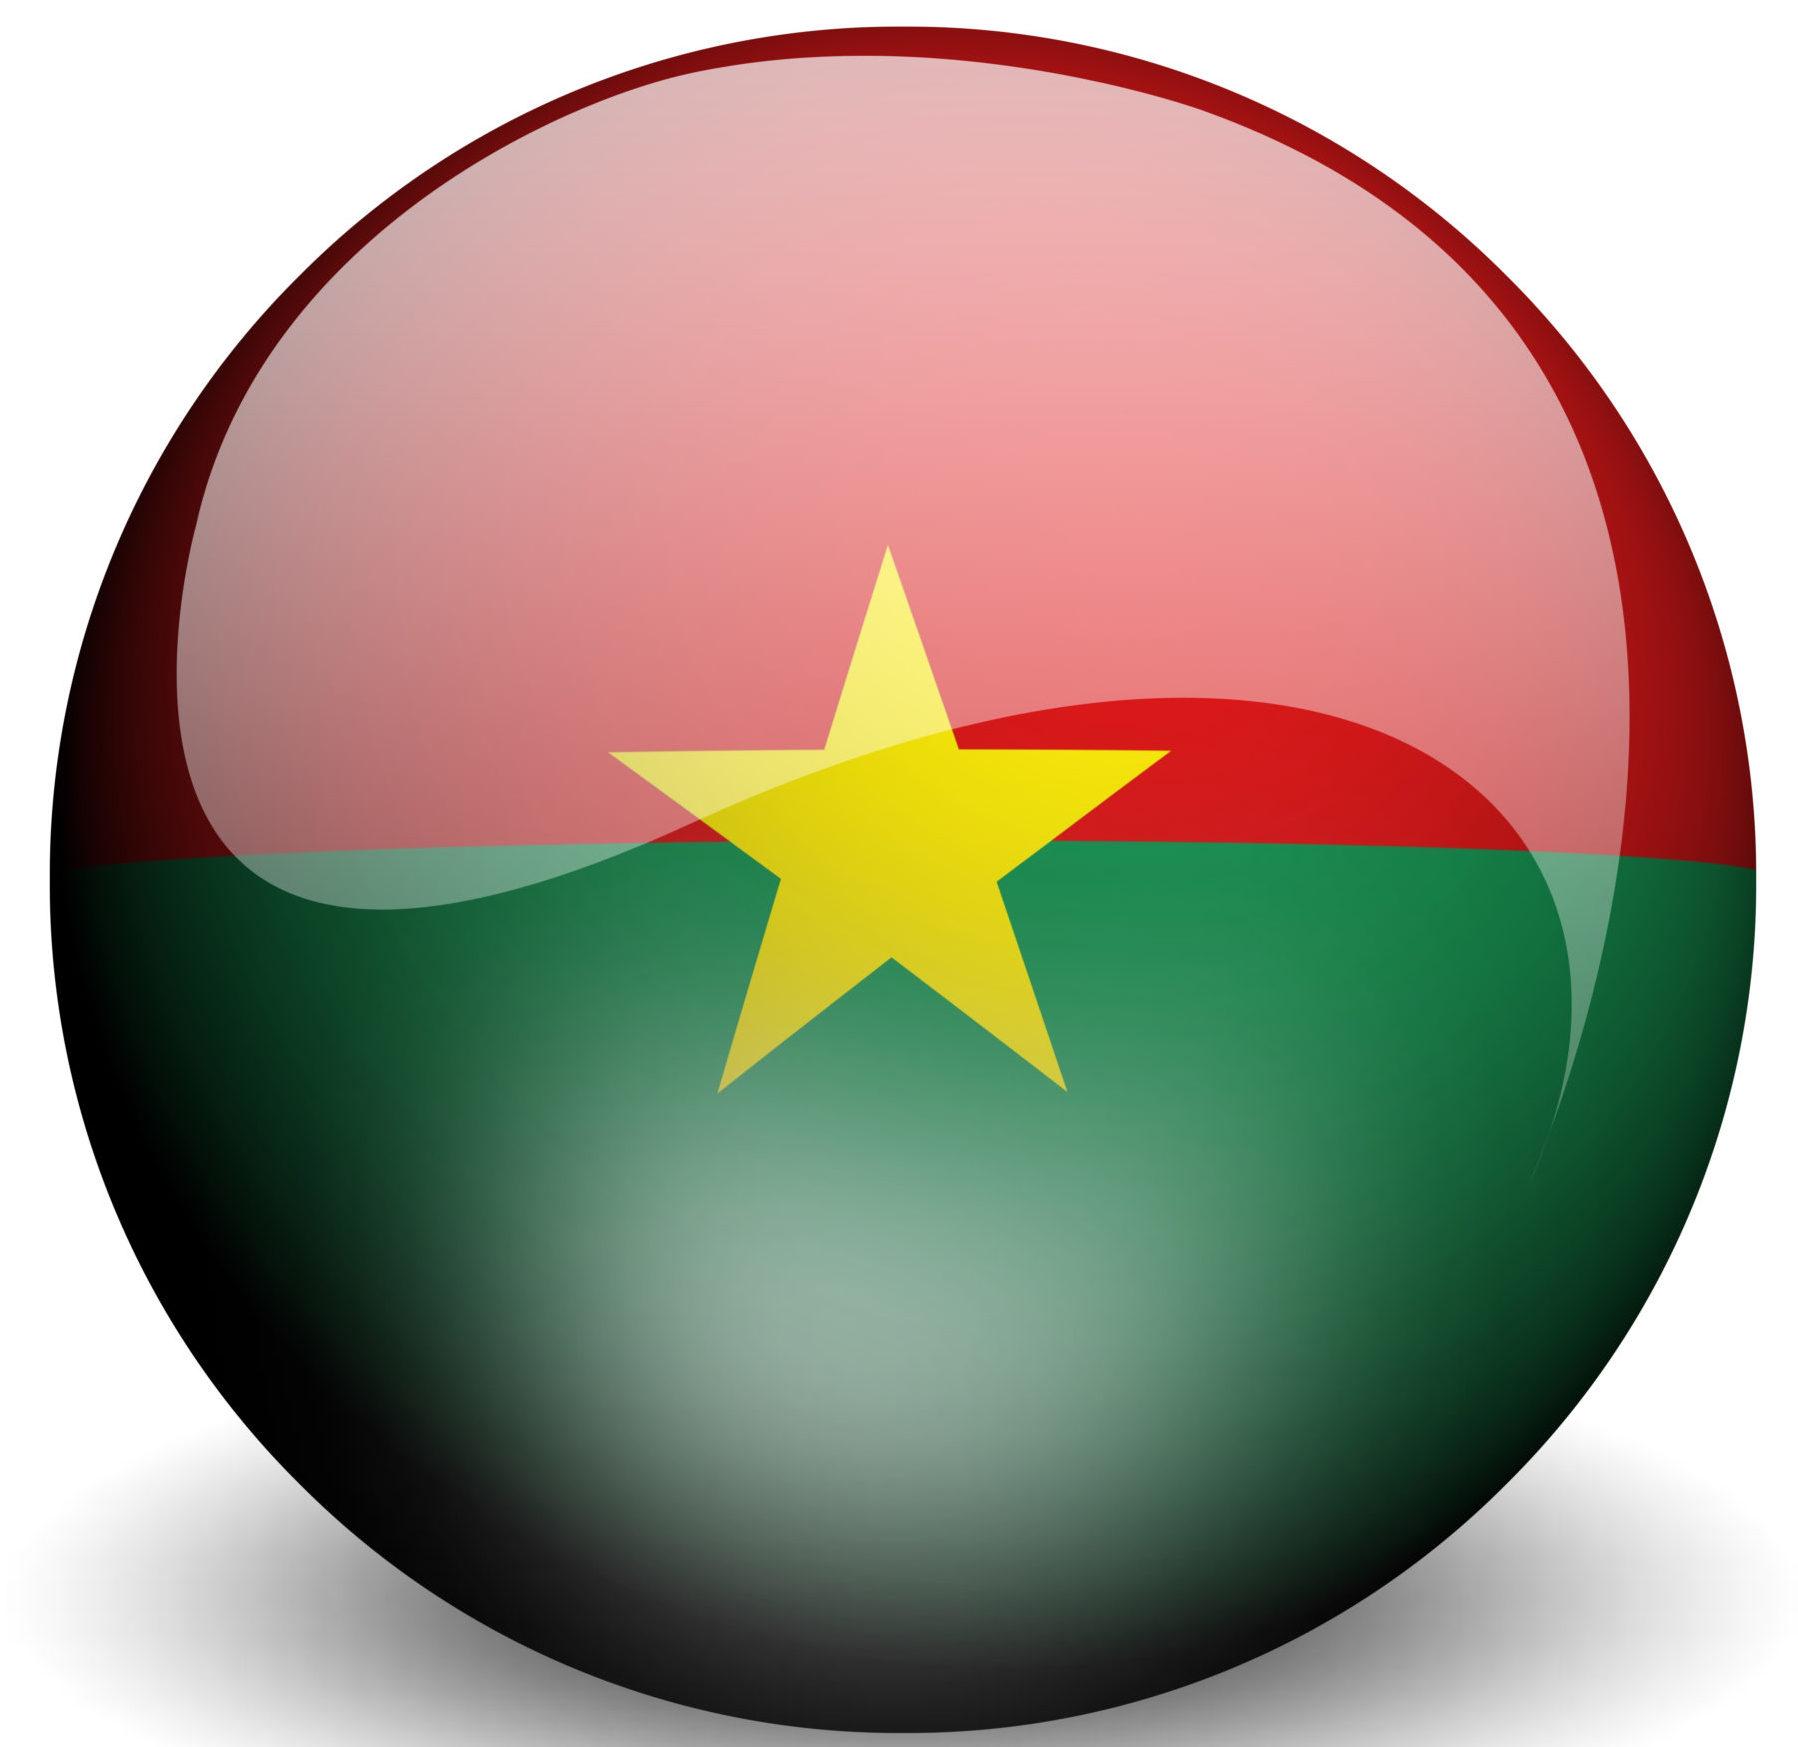 die Flagge von Burkina Faso im Yin Yang-Format